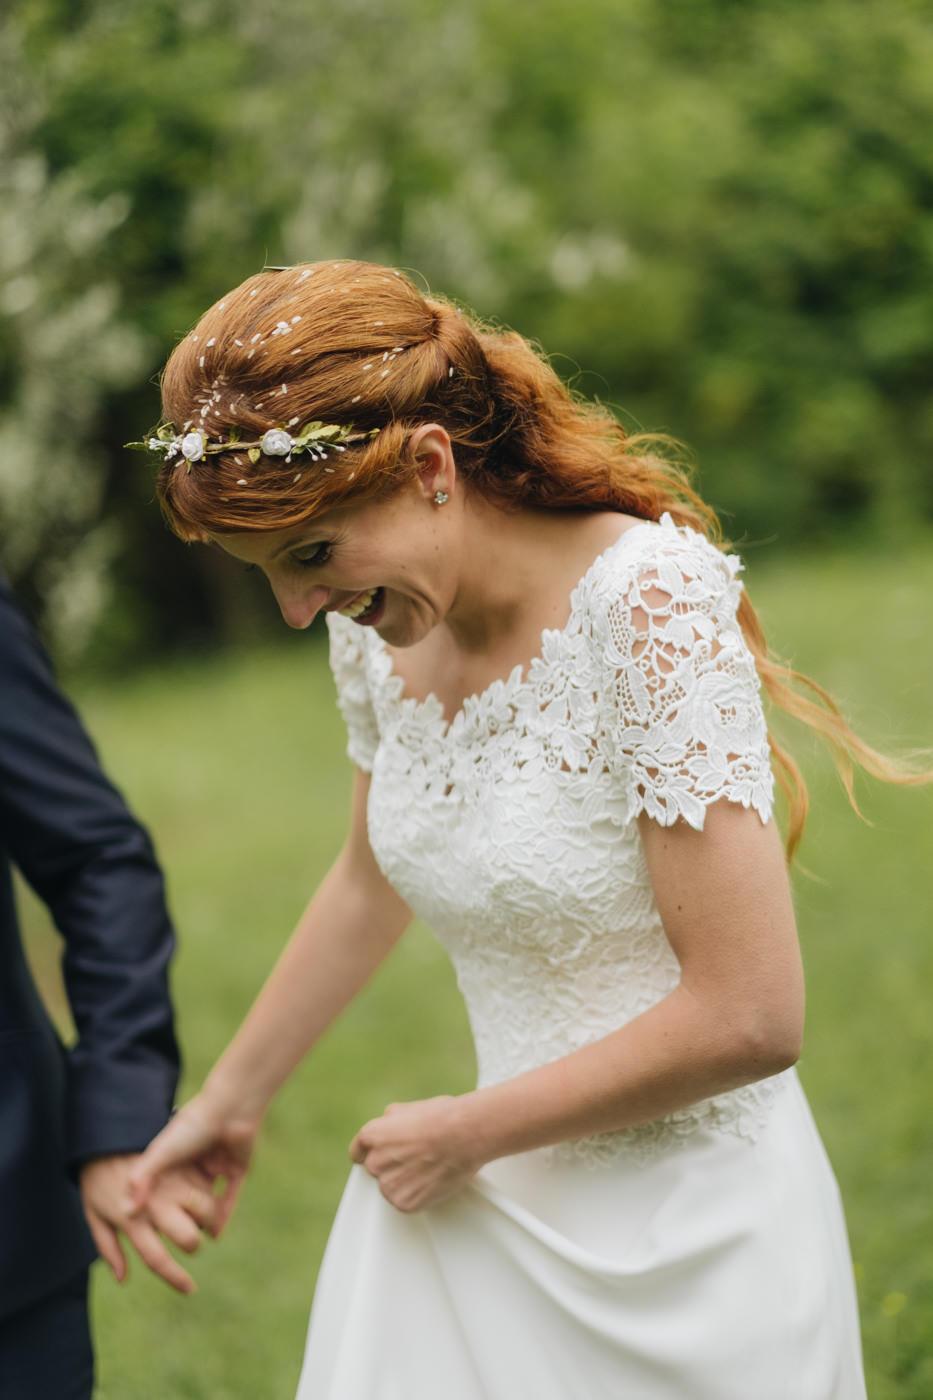 matrimoni_all_italiana_fotografo_matrimonio_toscana-58.jpg